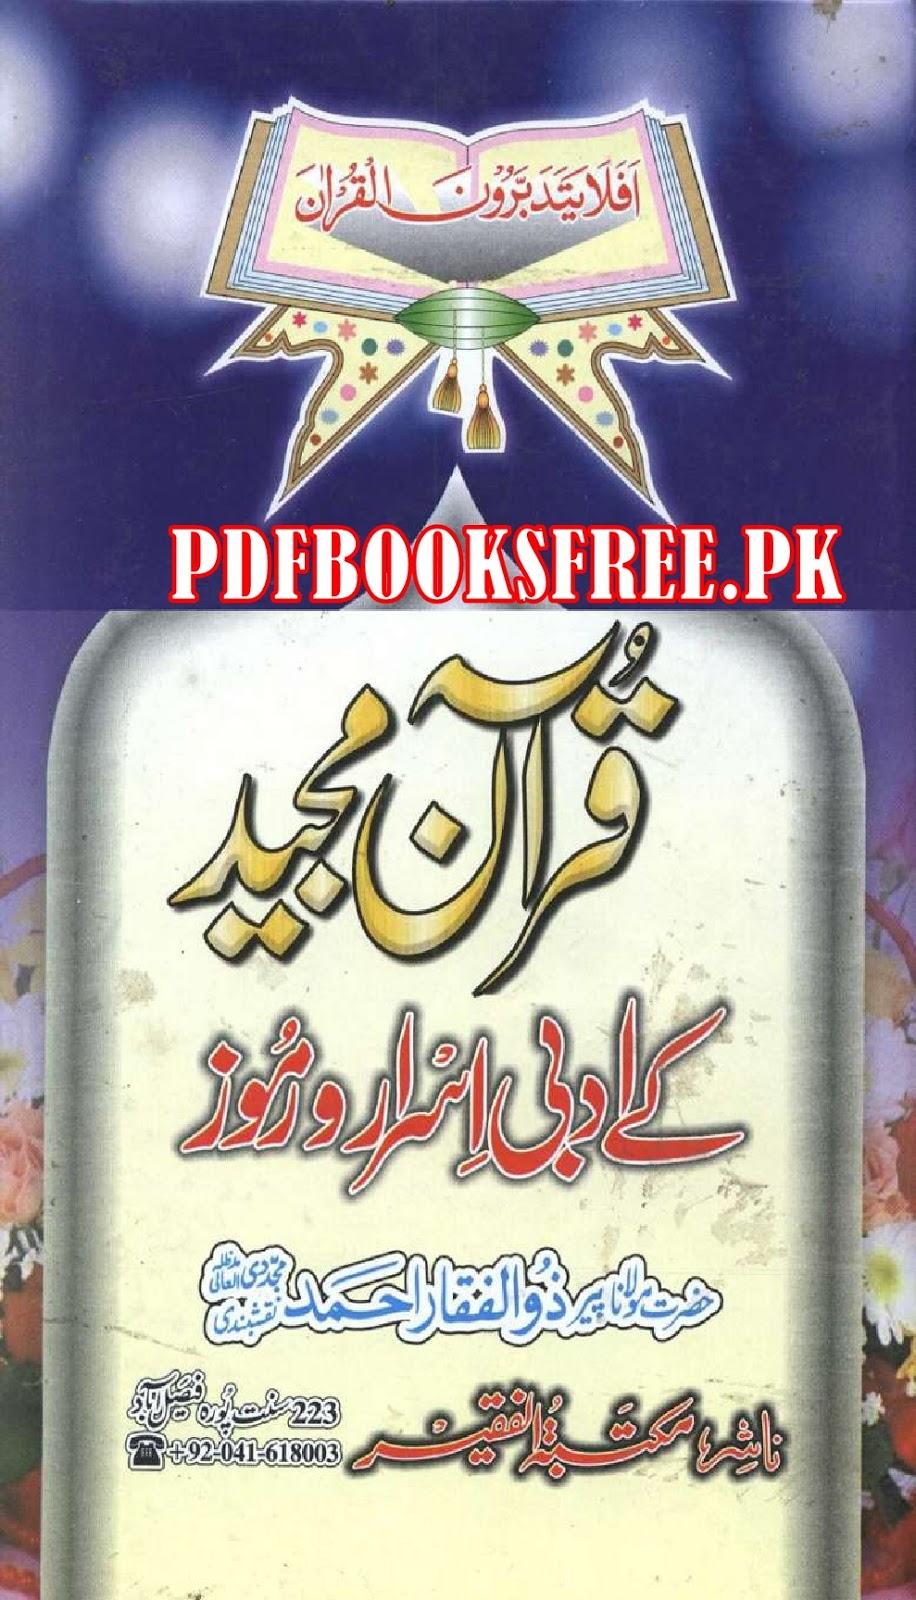 Quran Ke Adabi Asrar o Ramooz By Maulana Zulfiqar Ahmad Naqshbandi